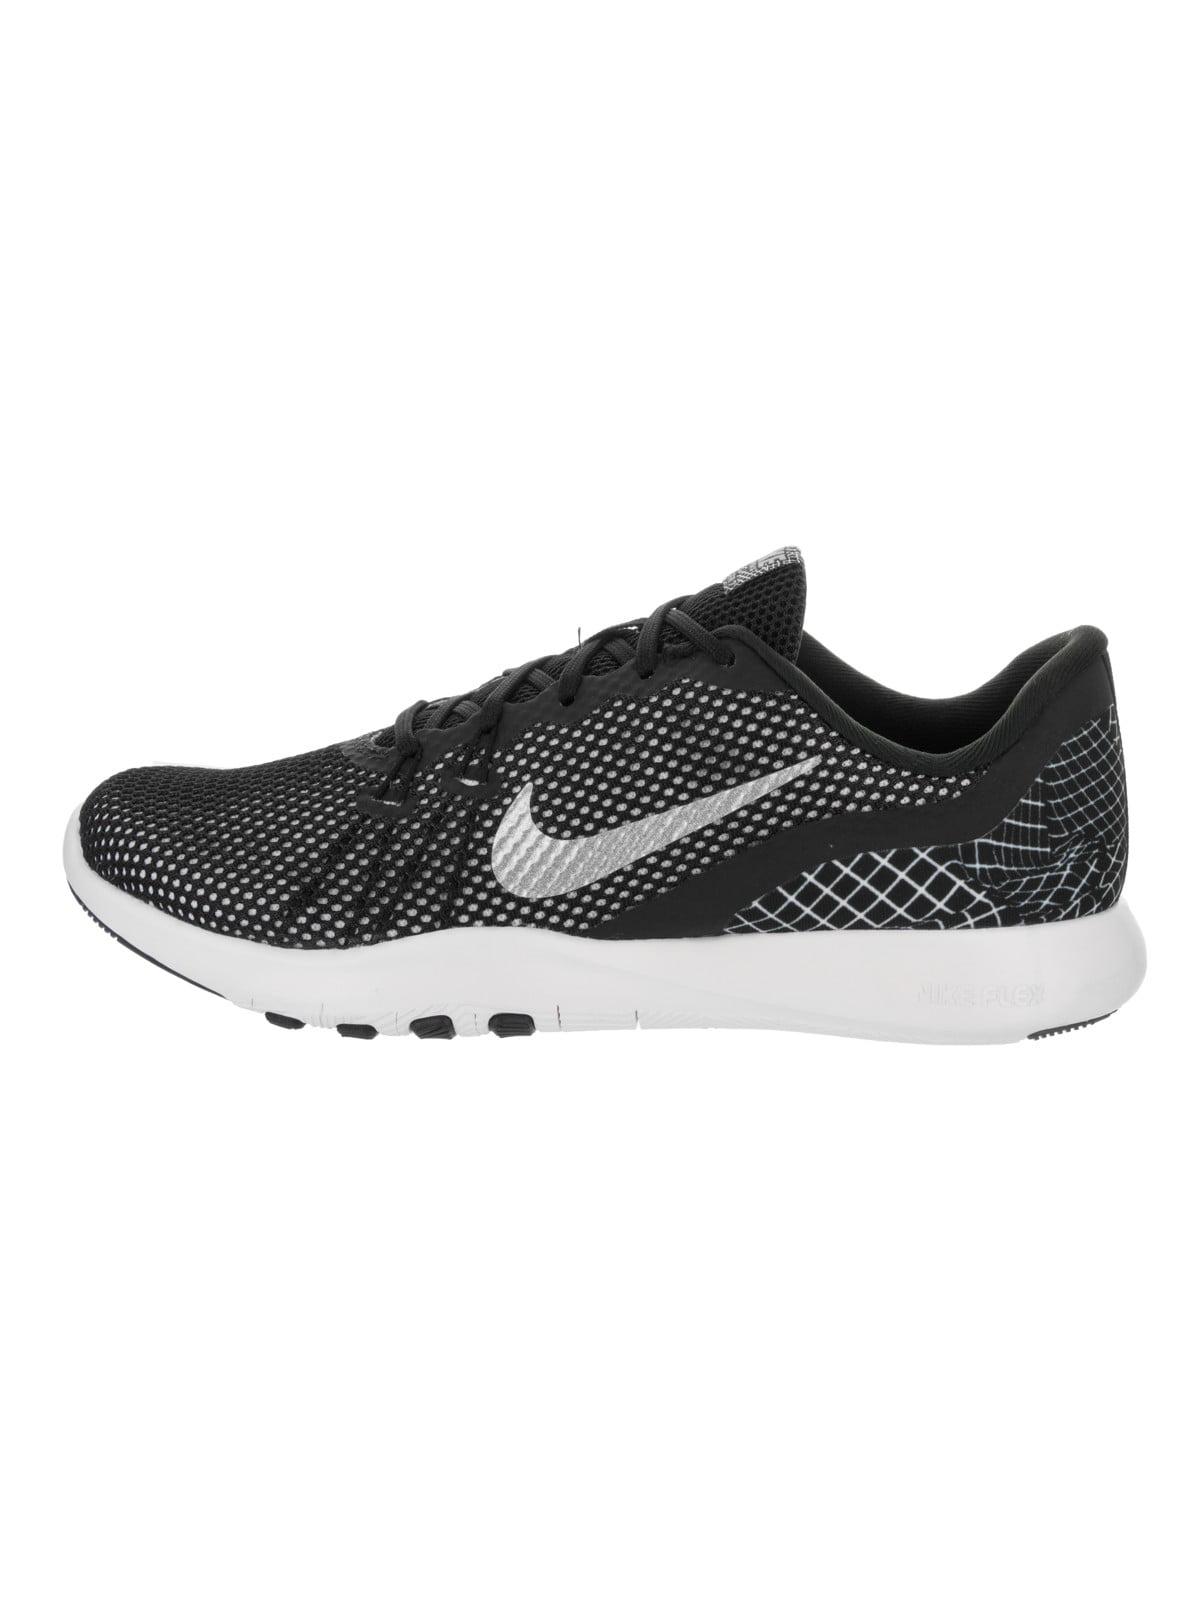 Nike Women's Flex Trainer 7 Print